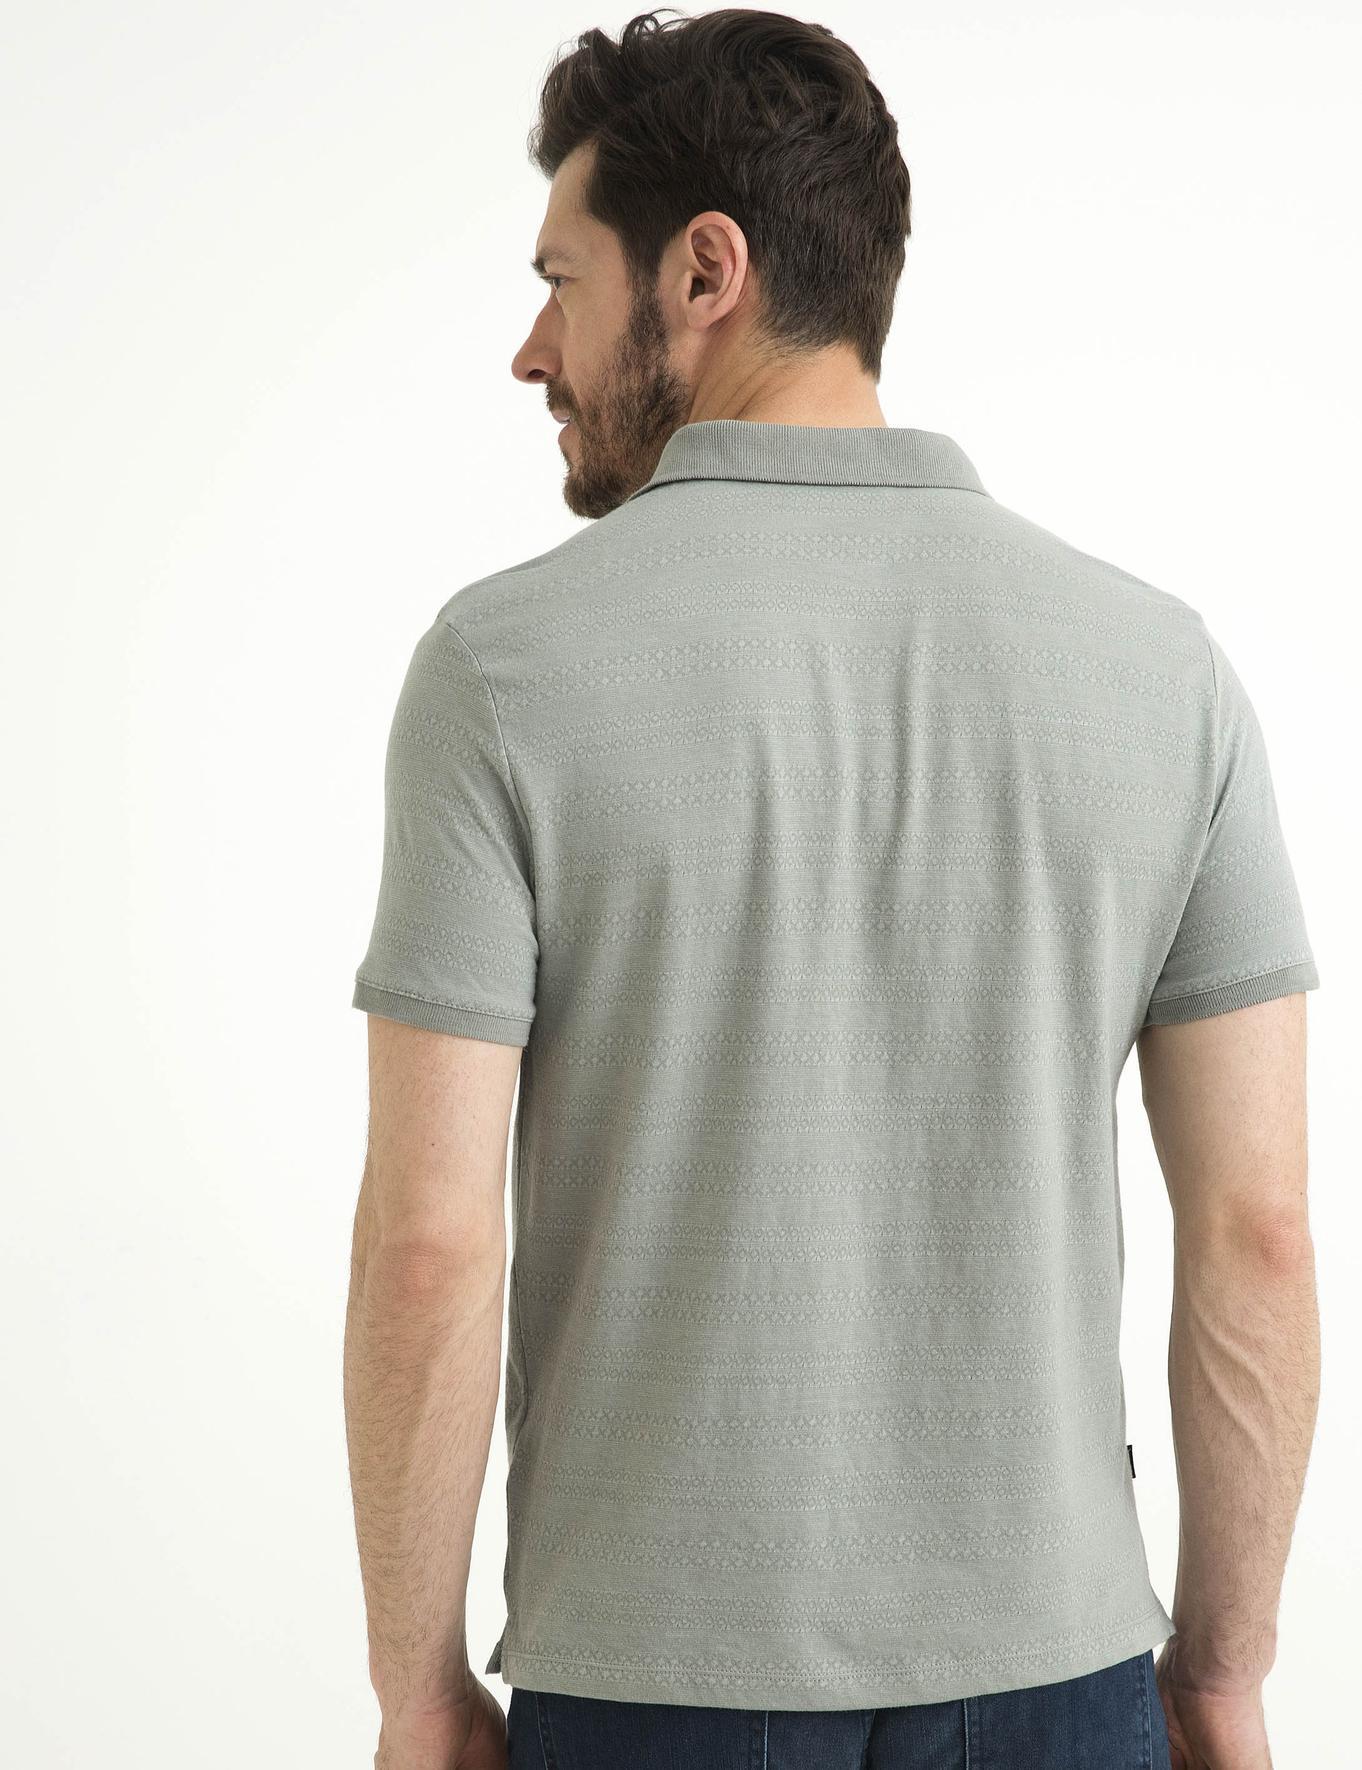 Açık Gri Slim Fit Polo Yaka T-Shirt